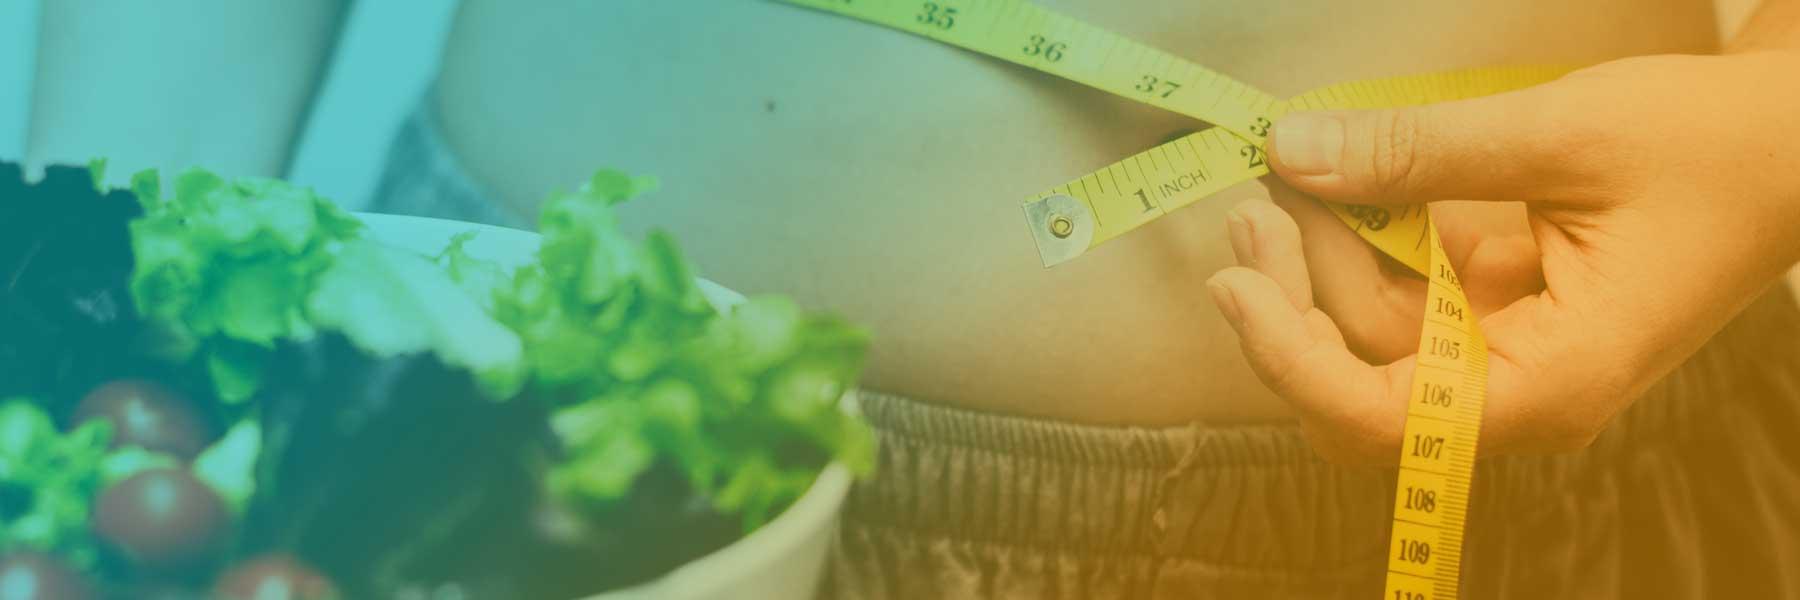 Genetics Testing - Weight Loss Program